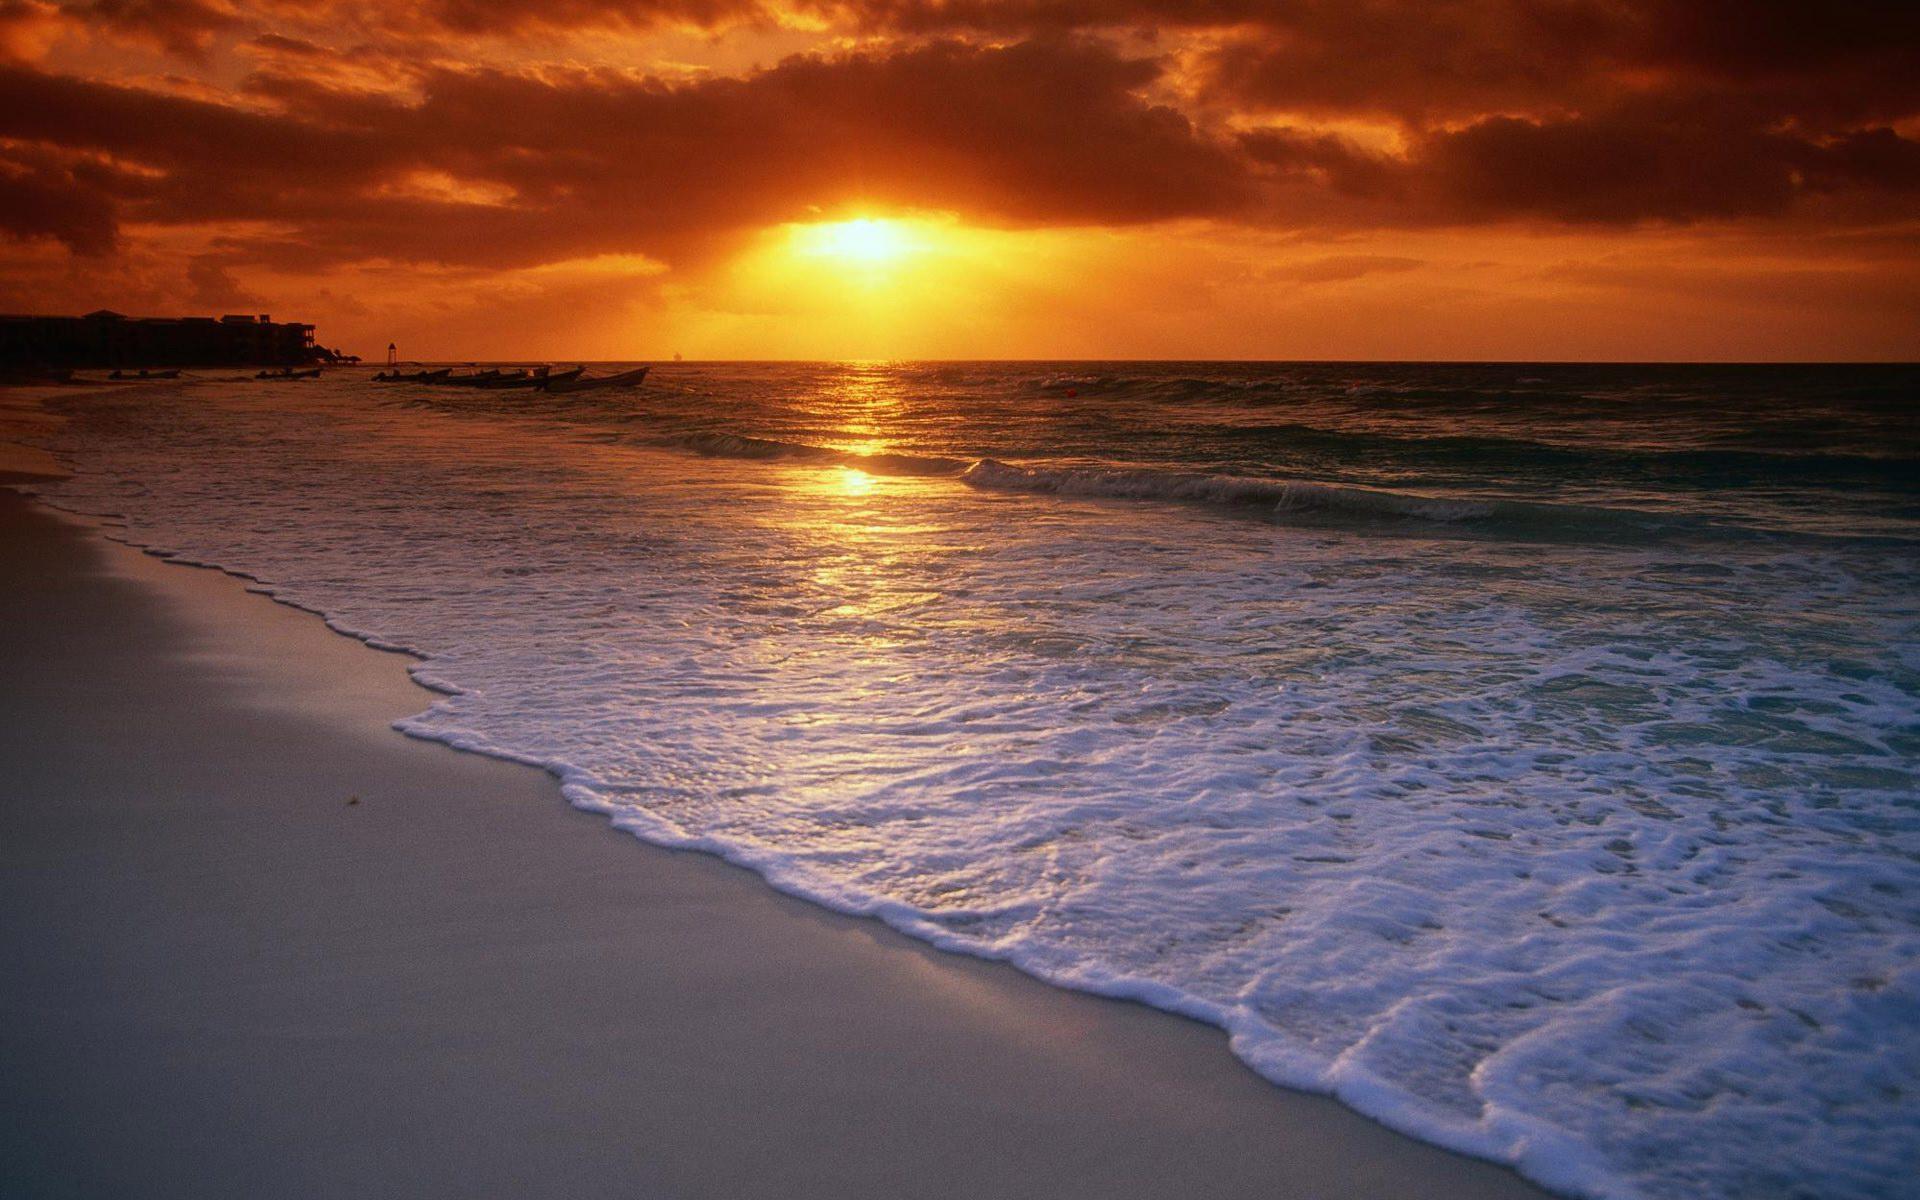 beautiful sunset beach hd wallpapers best desktop background natural scene hd wallpapers